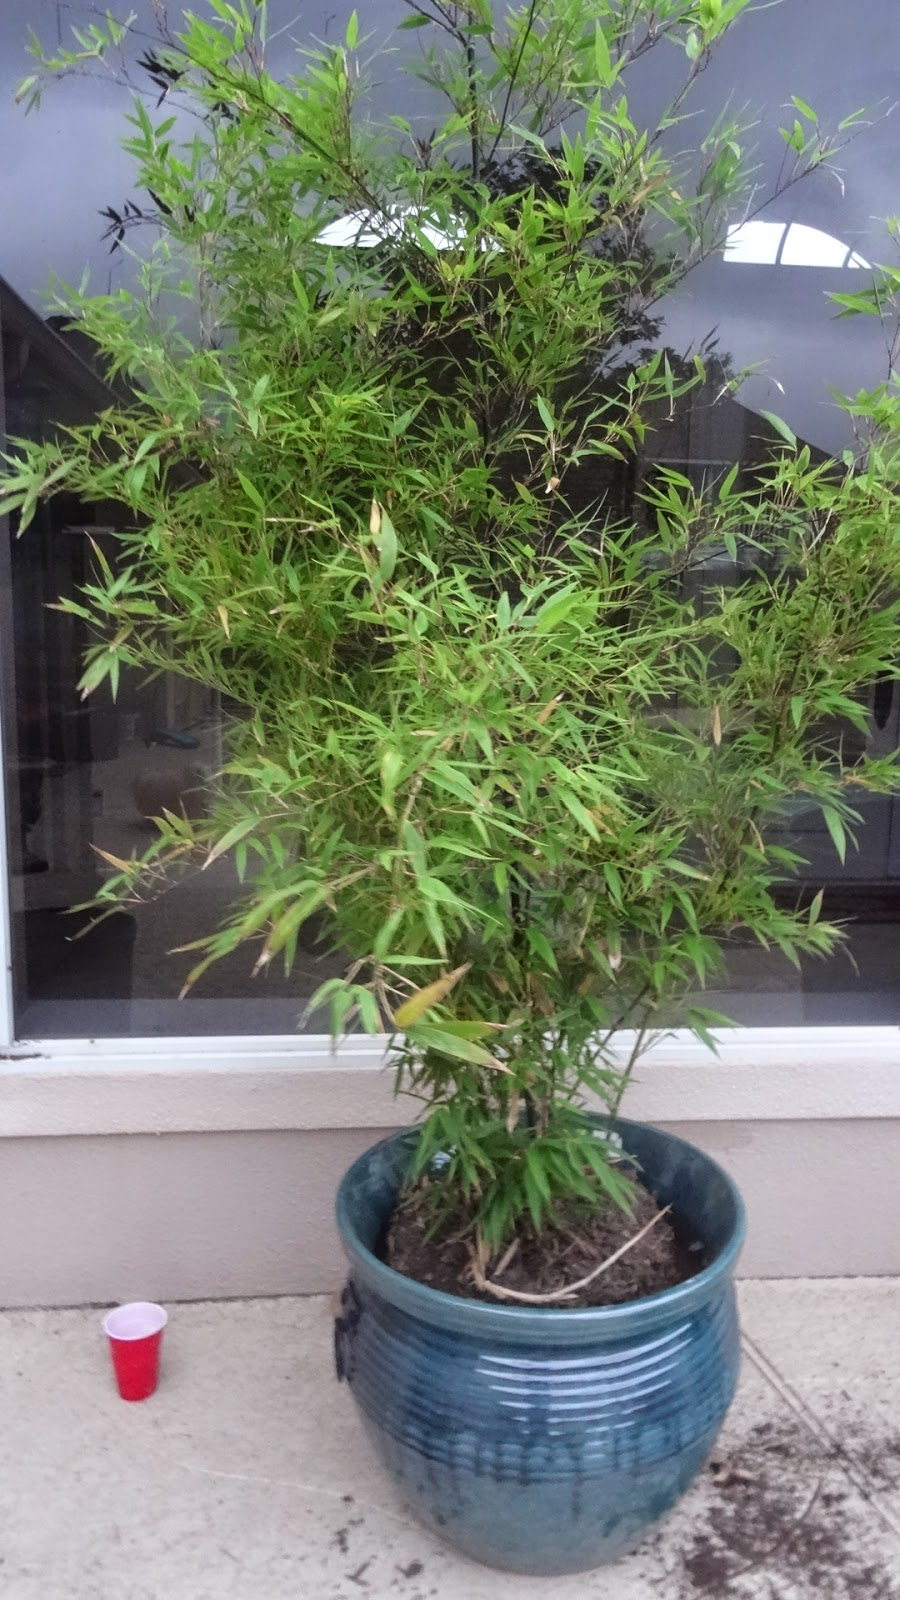 according to lenetta planting running black bamboo in pots